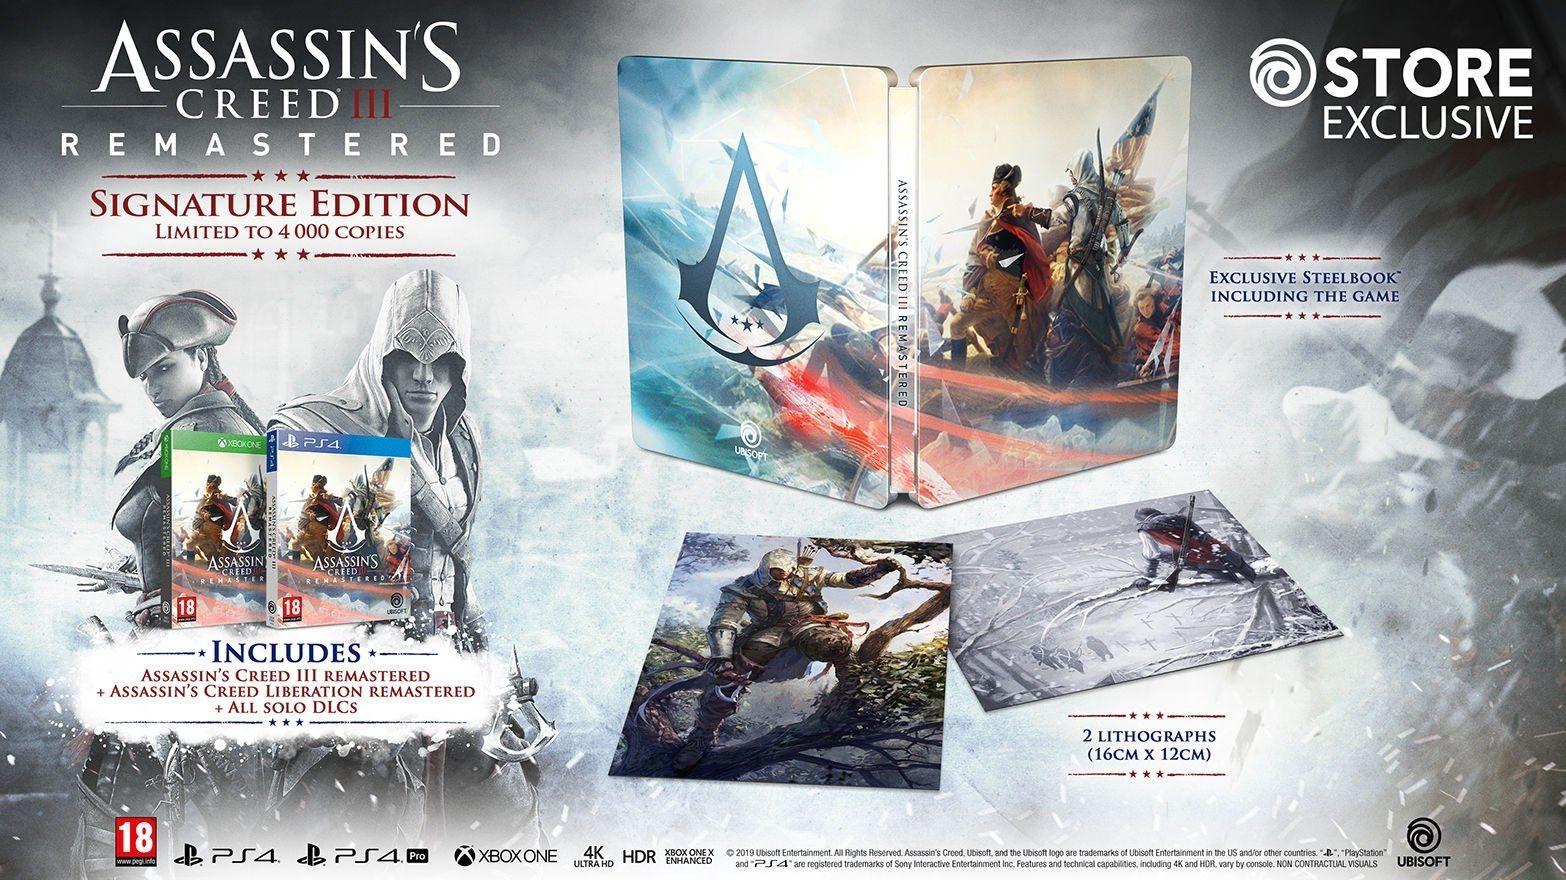 Assassin's Creed III : la version originale disparait au profit du Remaster